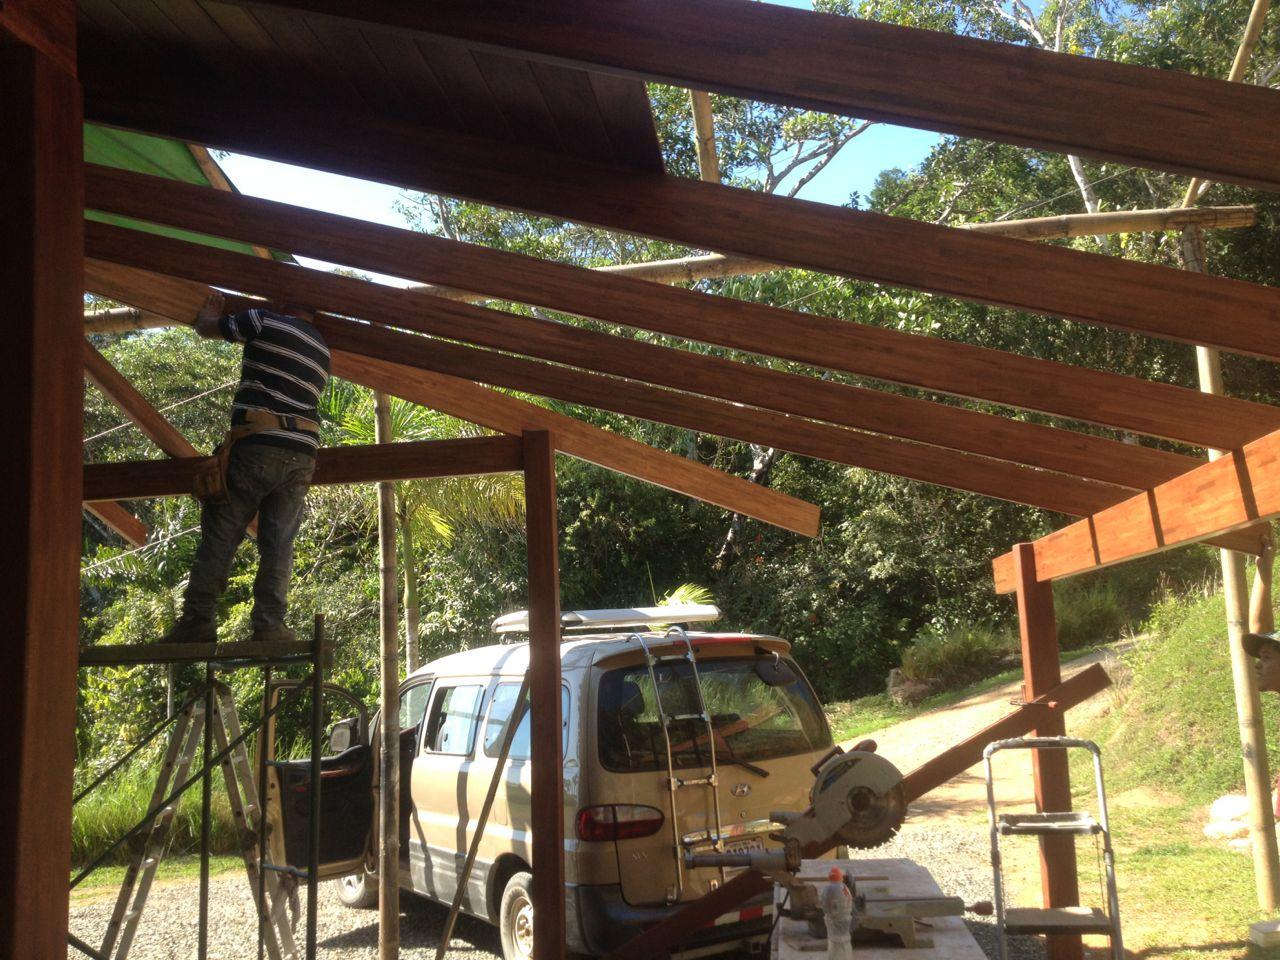 Carport rafters